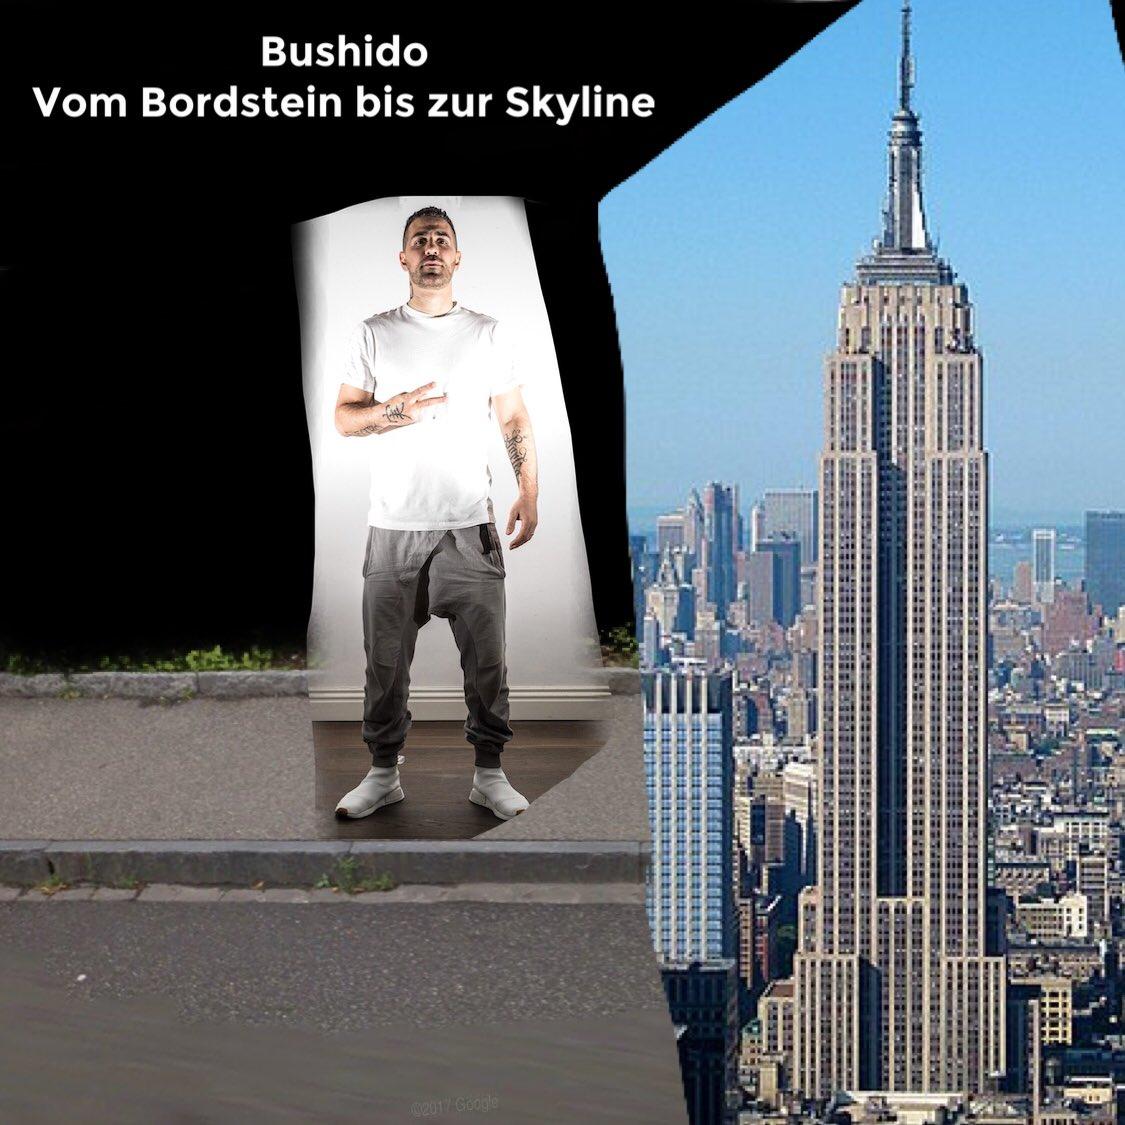 Bushido - Vom Bordstein bis zur Skyline  designed by Virgil Abloh pic.twitter.com/CMEr6NDsJe  by joni